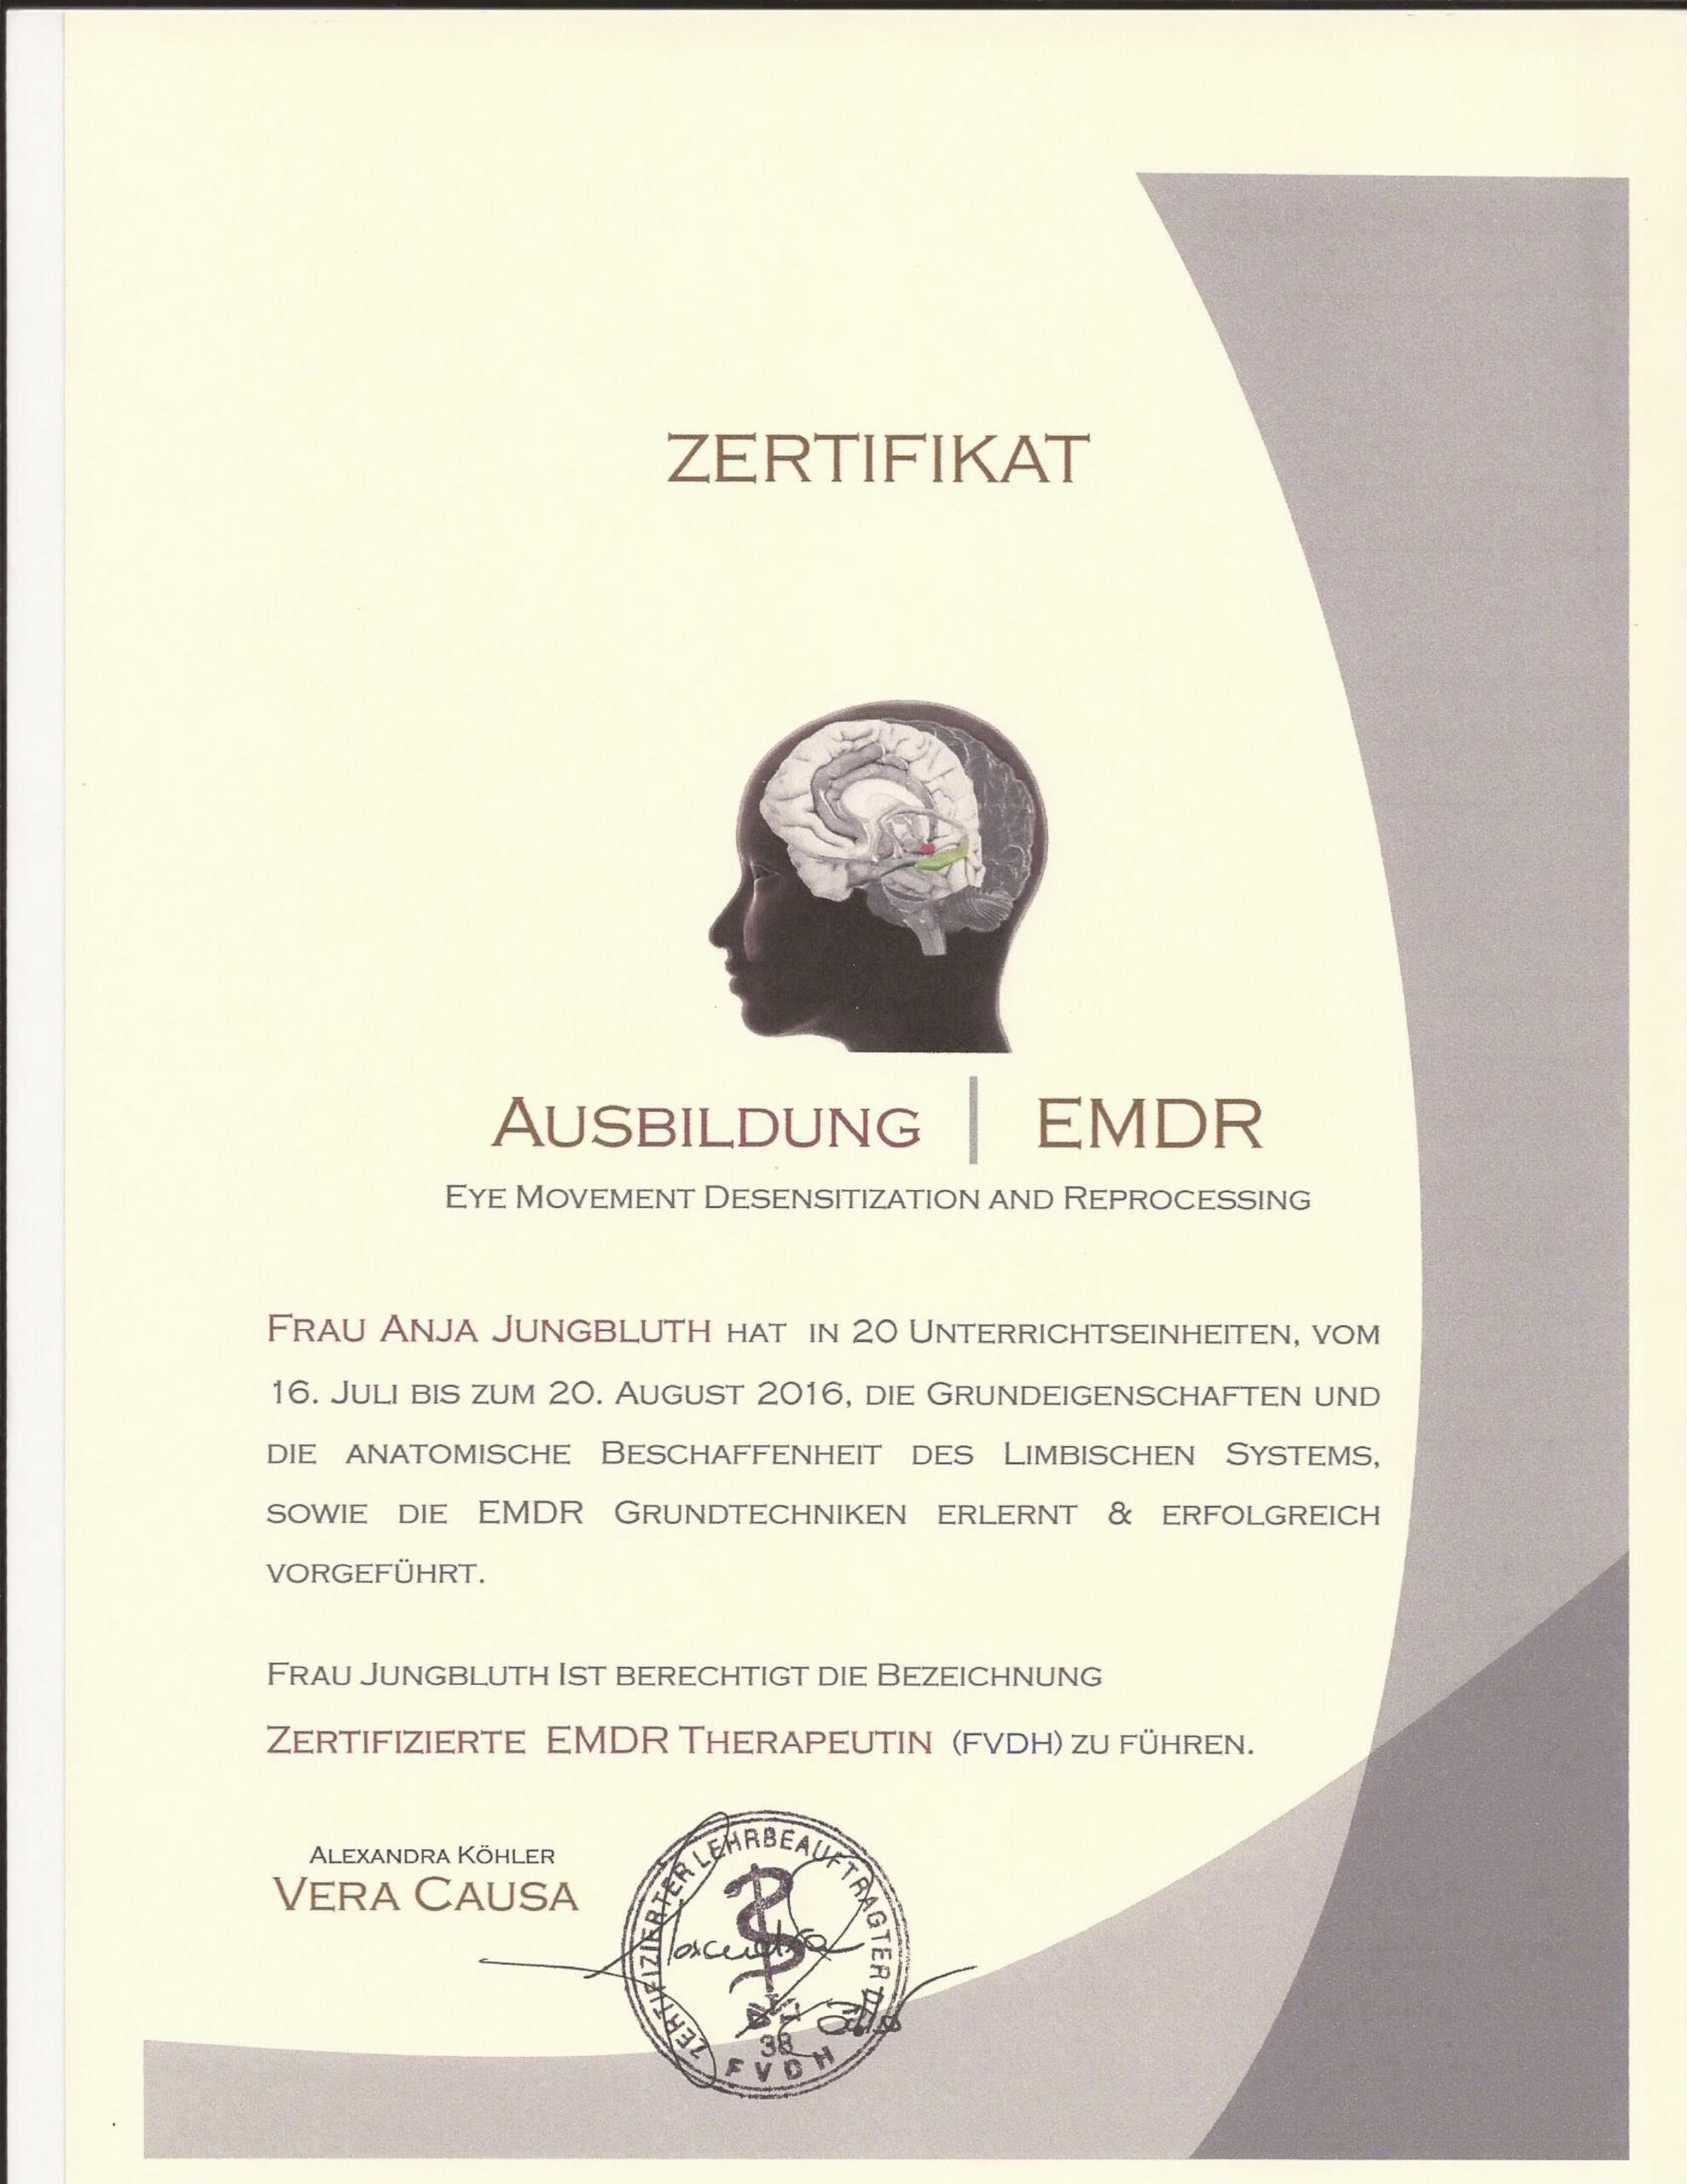 EMDR Zertifikat